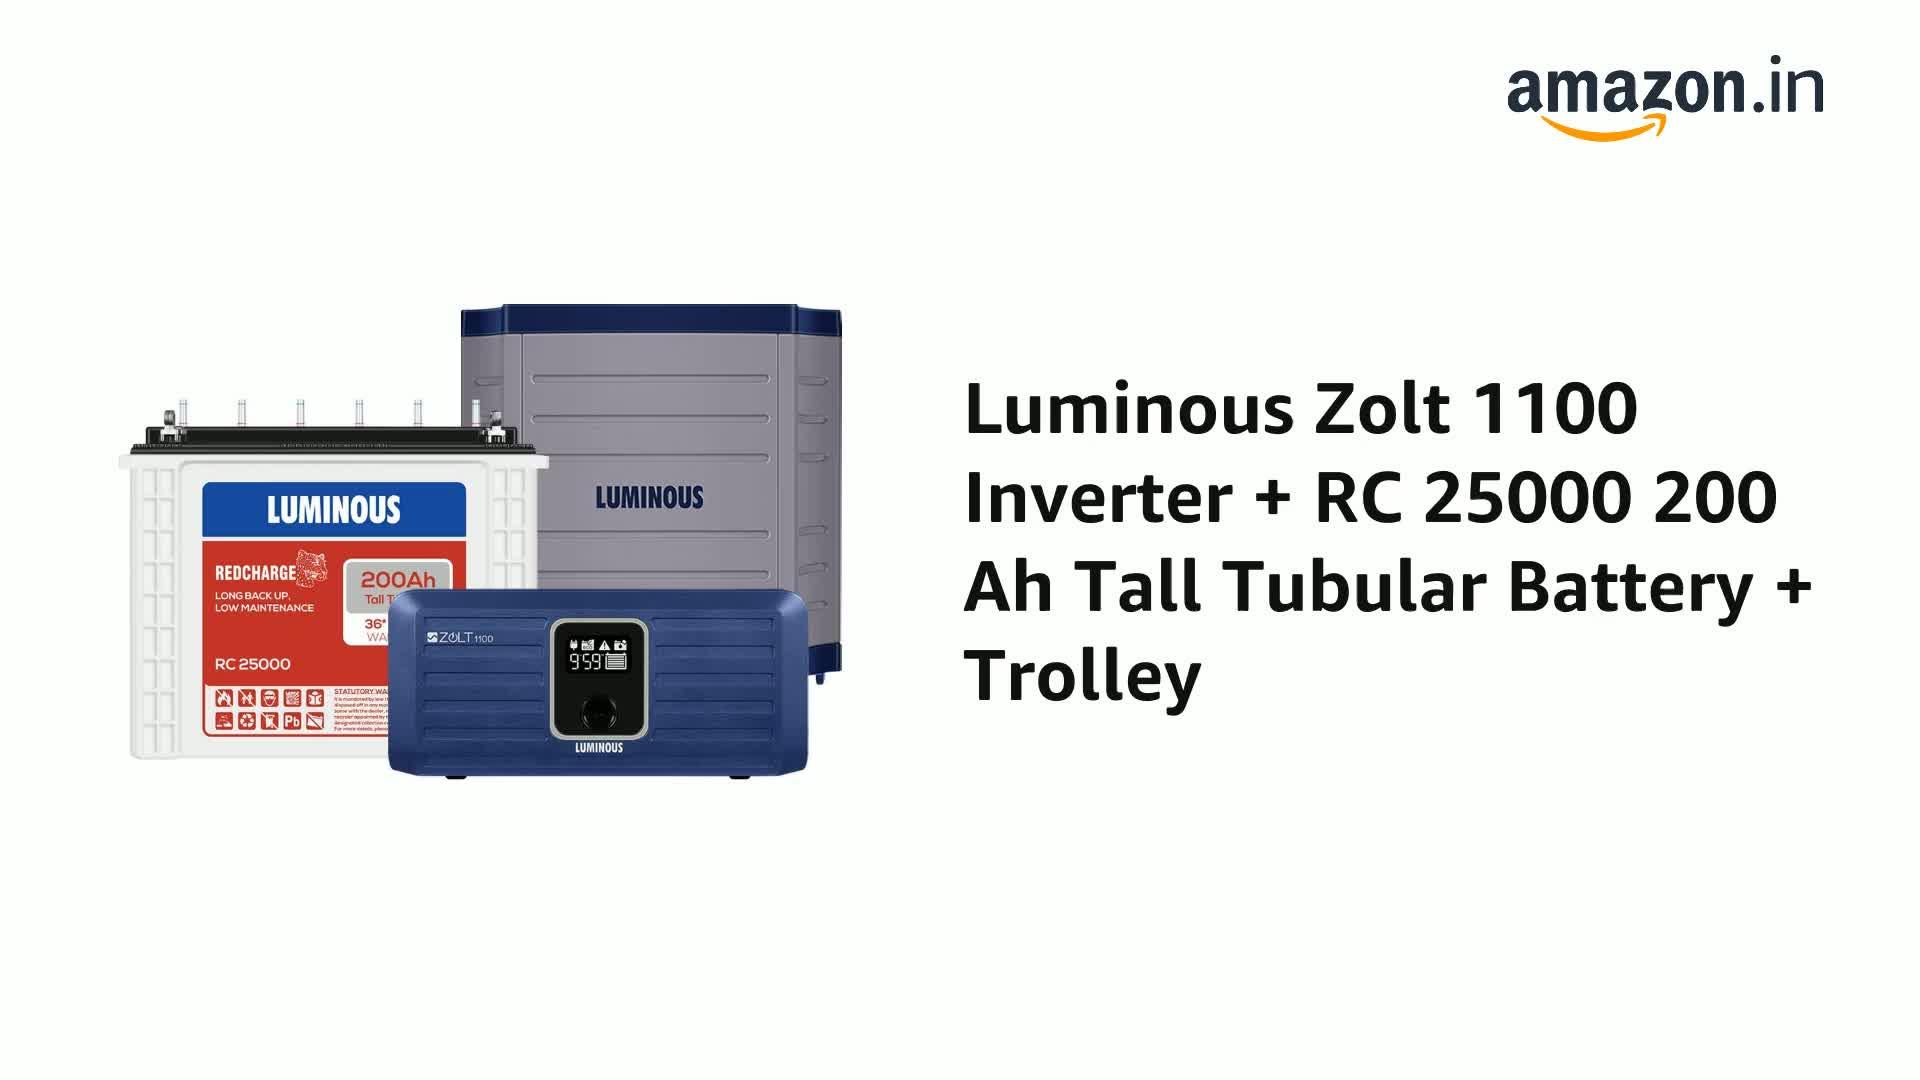 Luminous Zolt 1100 Inverter + RC 25000 200 Ah Tall Tubular Battery + Trolley (Blue) 2021 June Value for money, longer life and less maintenance